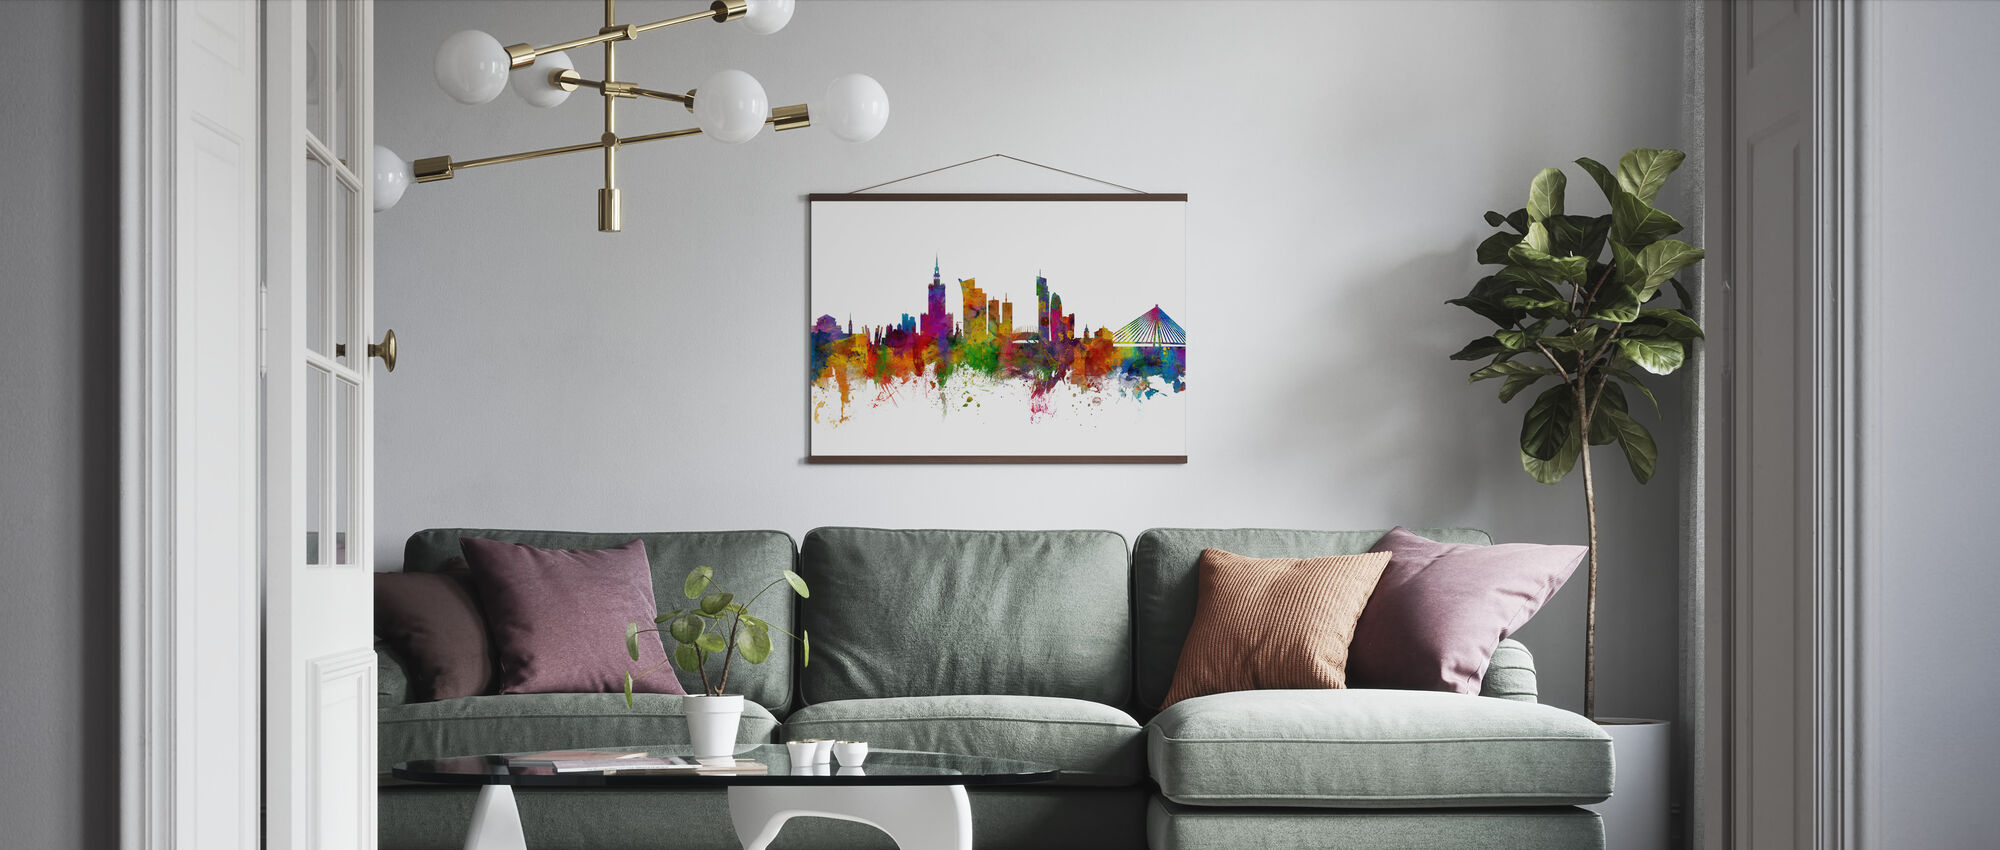 Warsaw Skyline - Poster - Living Room